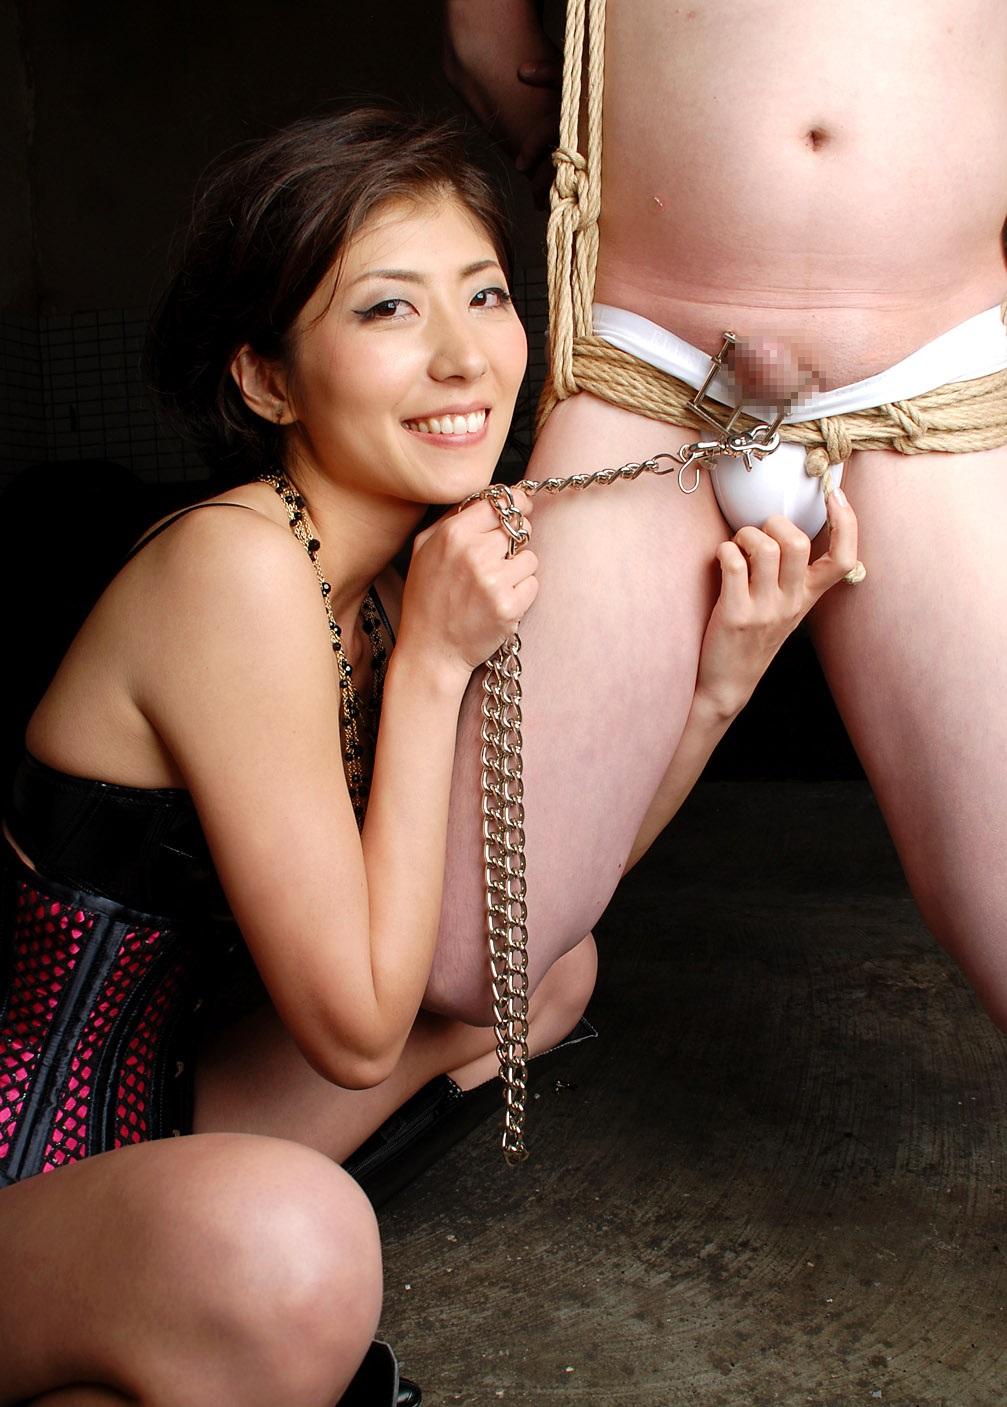 【SMエロ画像】跪きなさい…セクシー女王様によるありがたいお仕置きの数々www 30